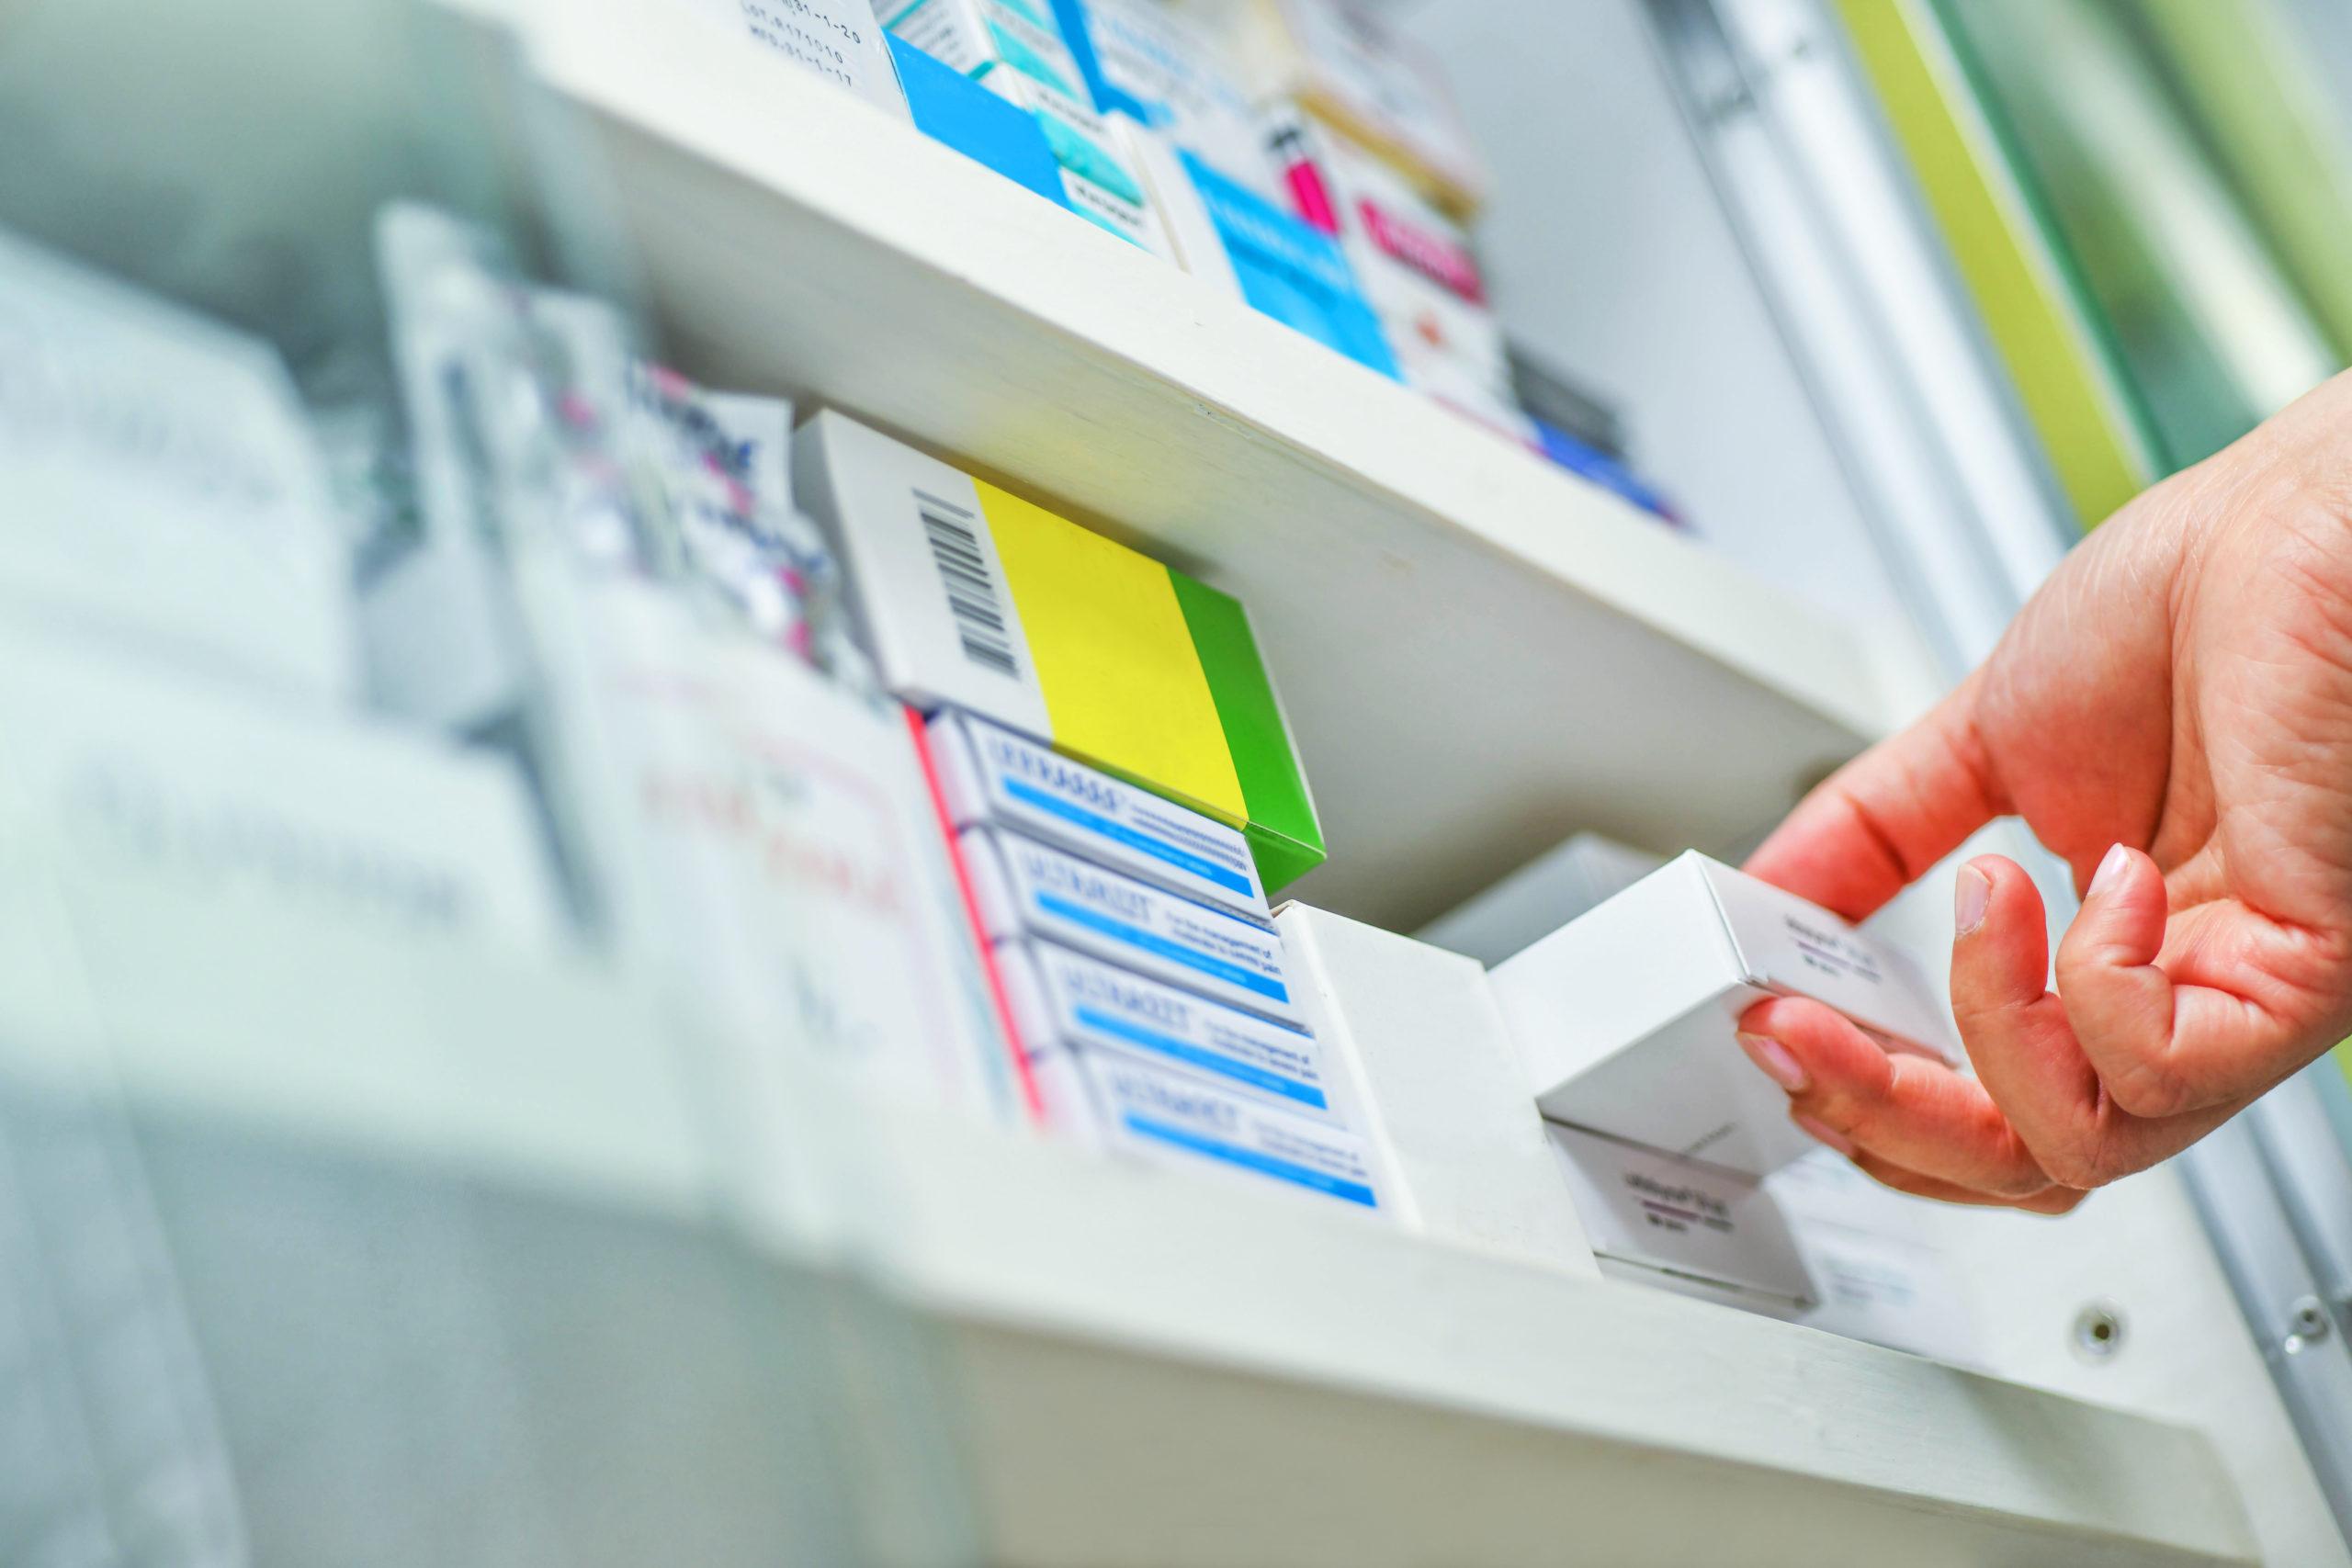 Pharmacy drug cabinet (Photo credit: Shutterstock)